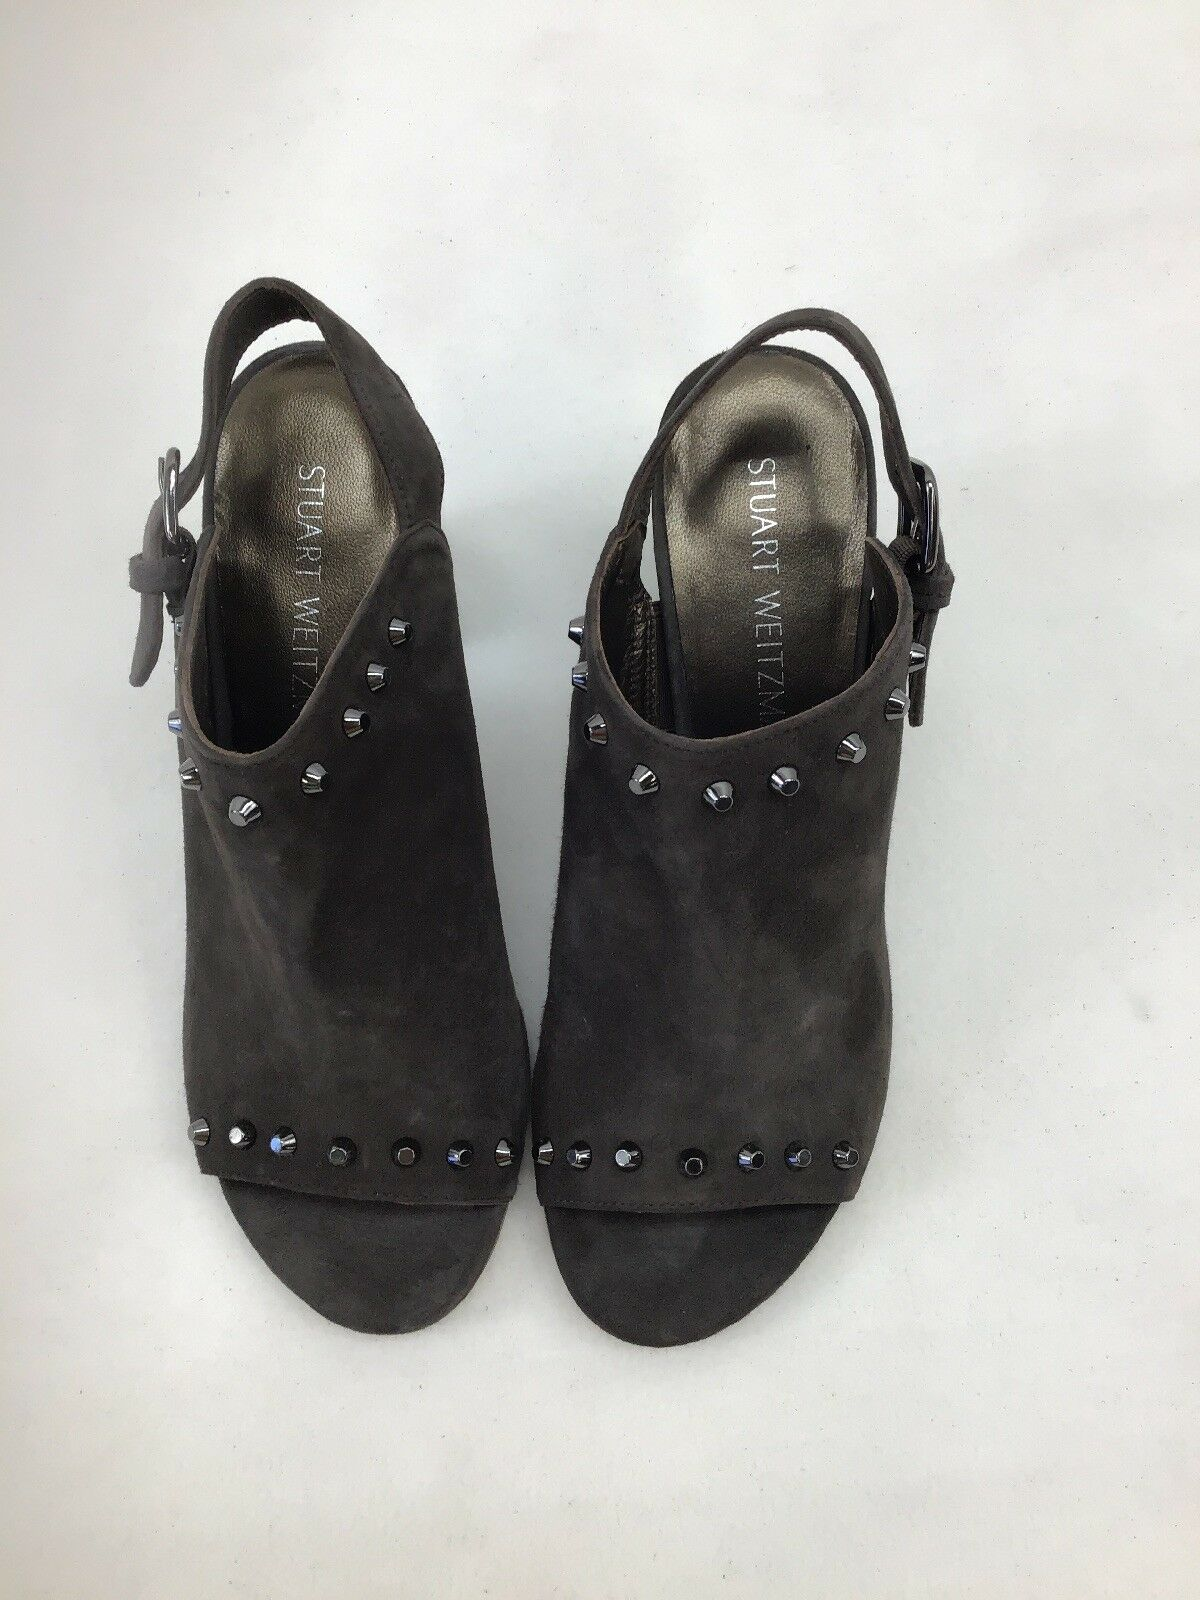 Stuart Weitzman commodor Londra tamaño Zapato De Gamuza 7M F273 F273 F273   al precio mas bajo